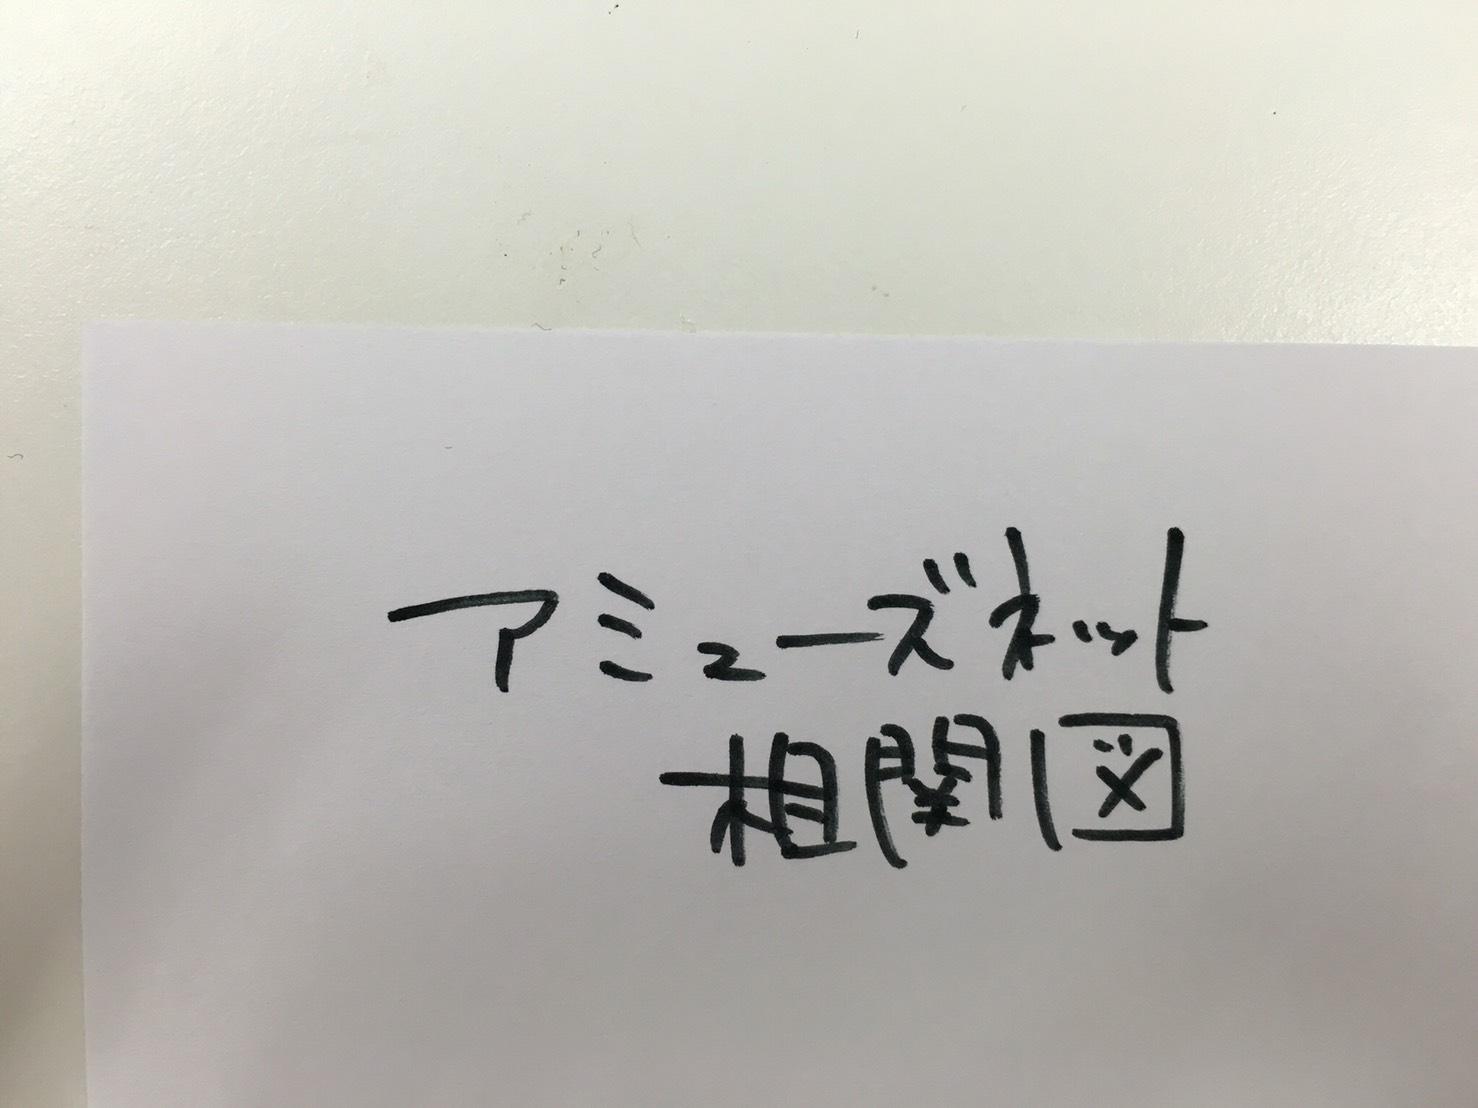 S__6864898.jpg